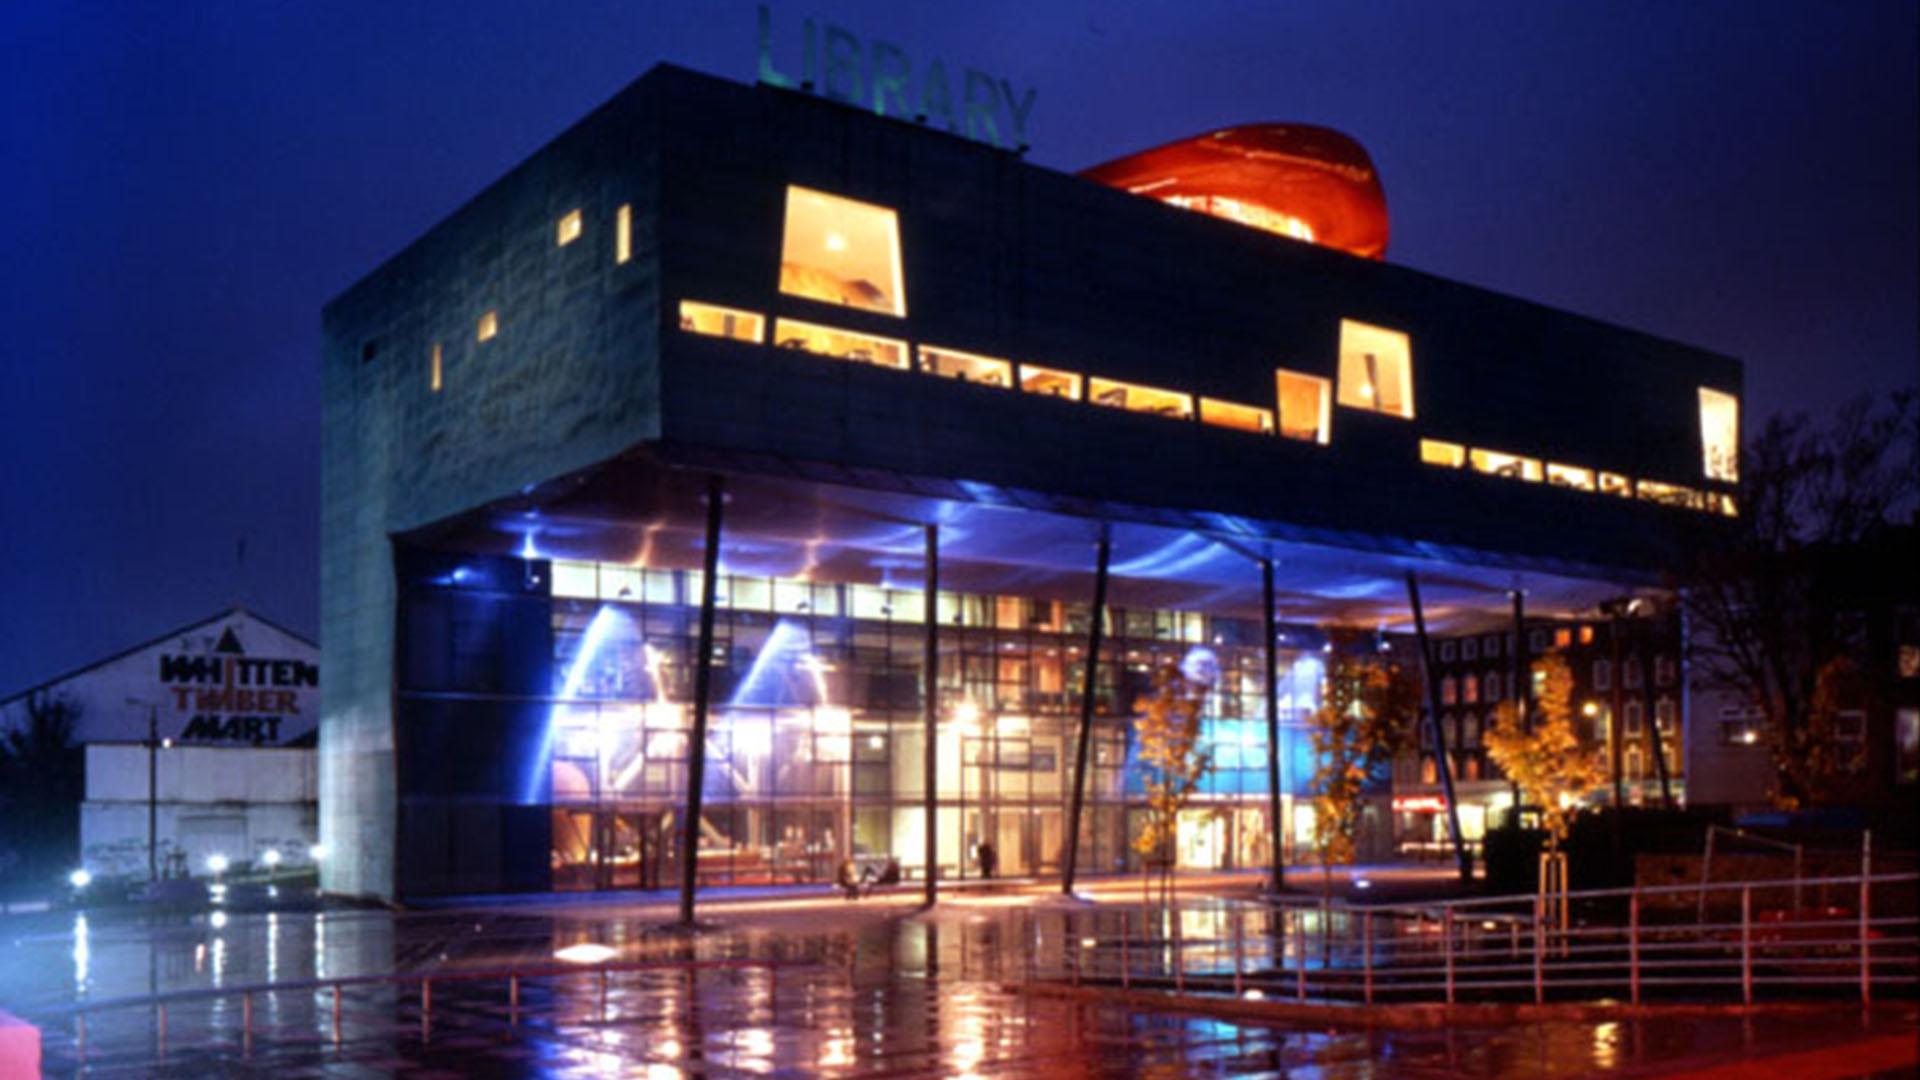 Peckham Library - London -